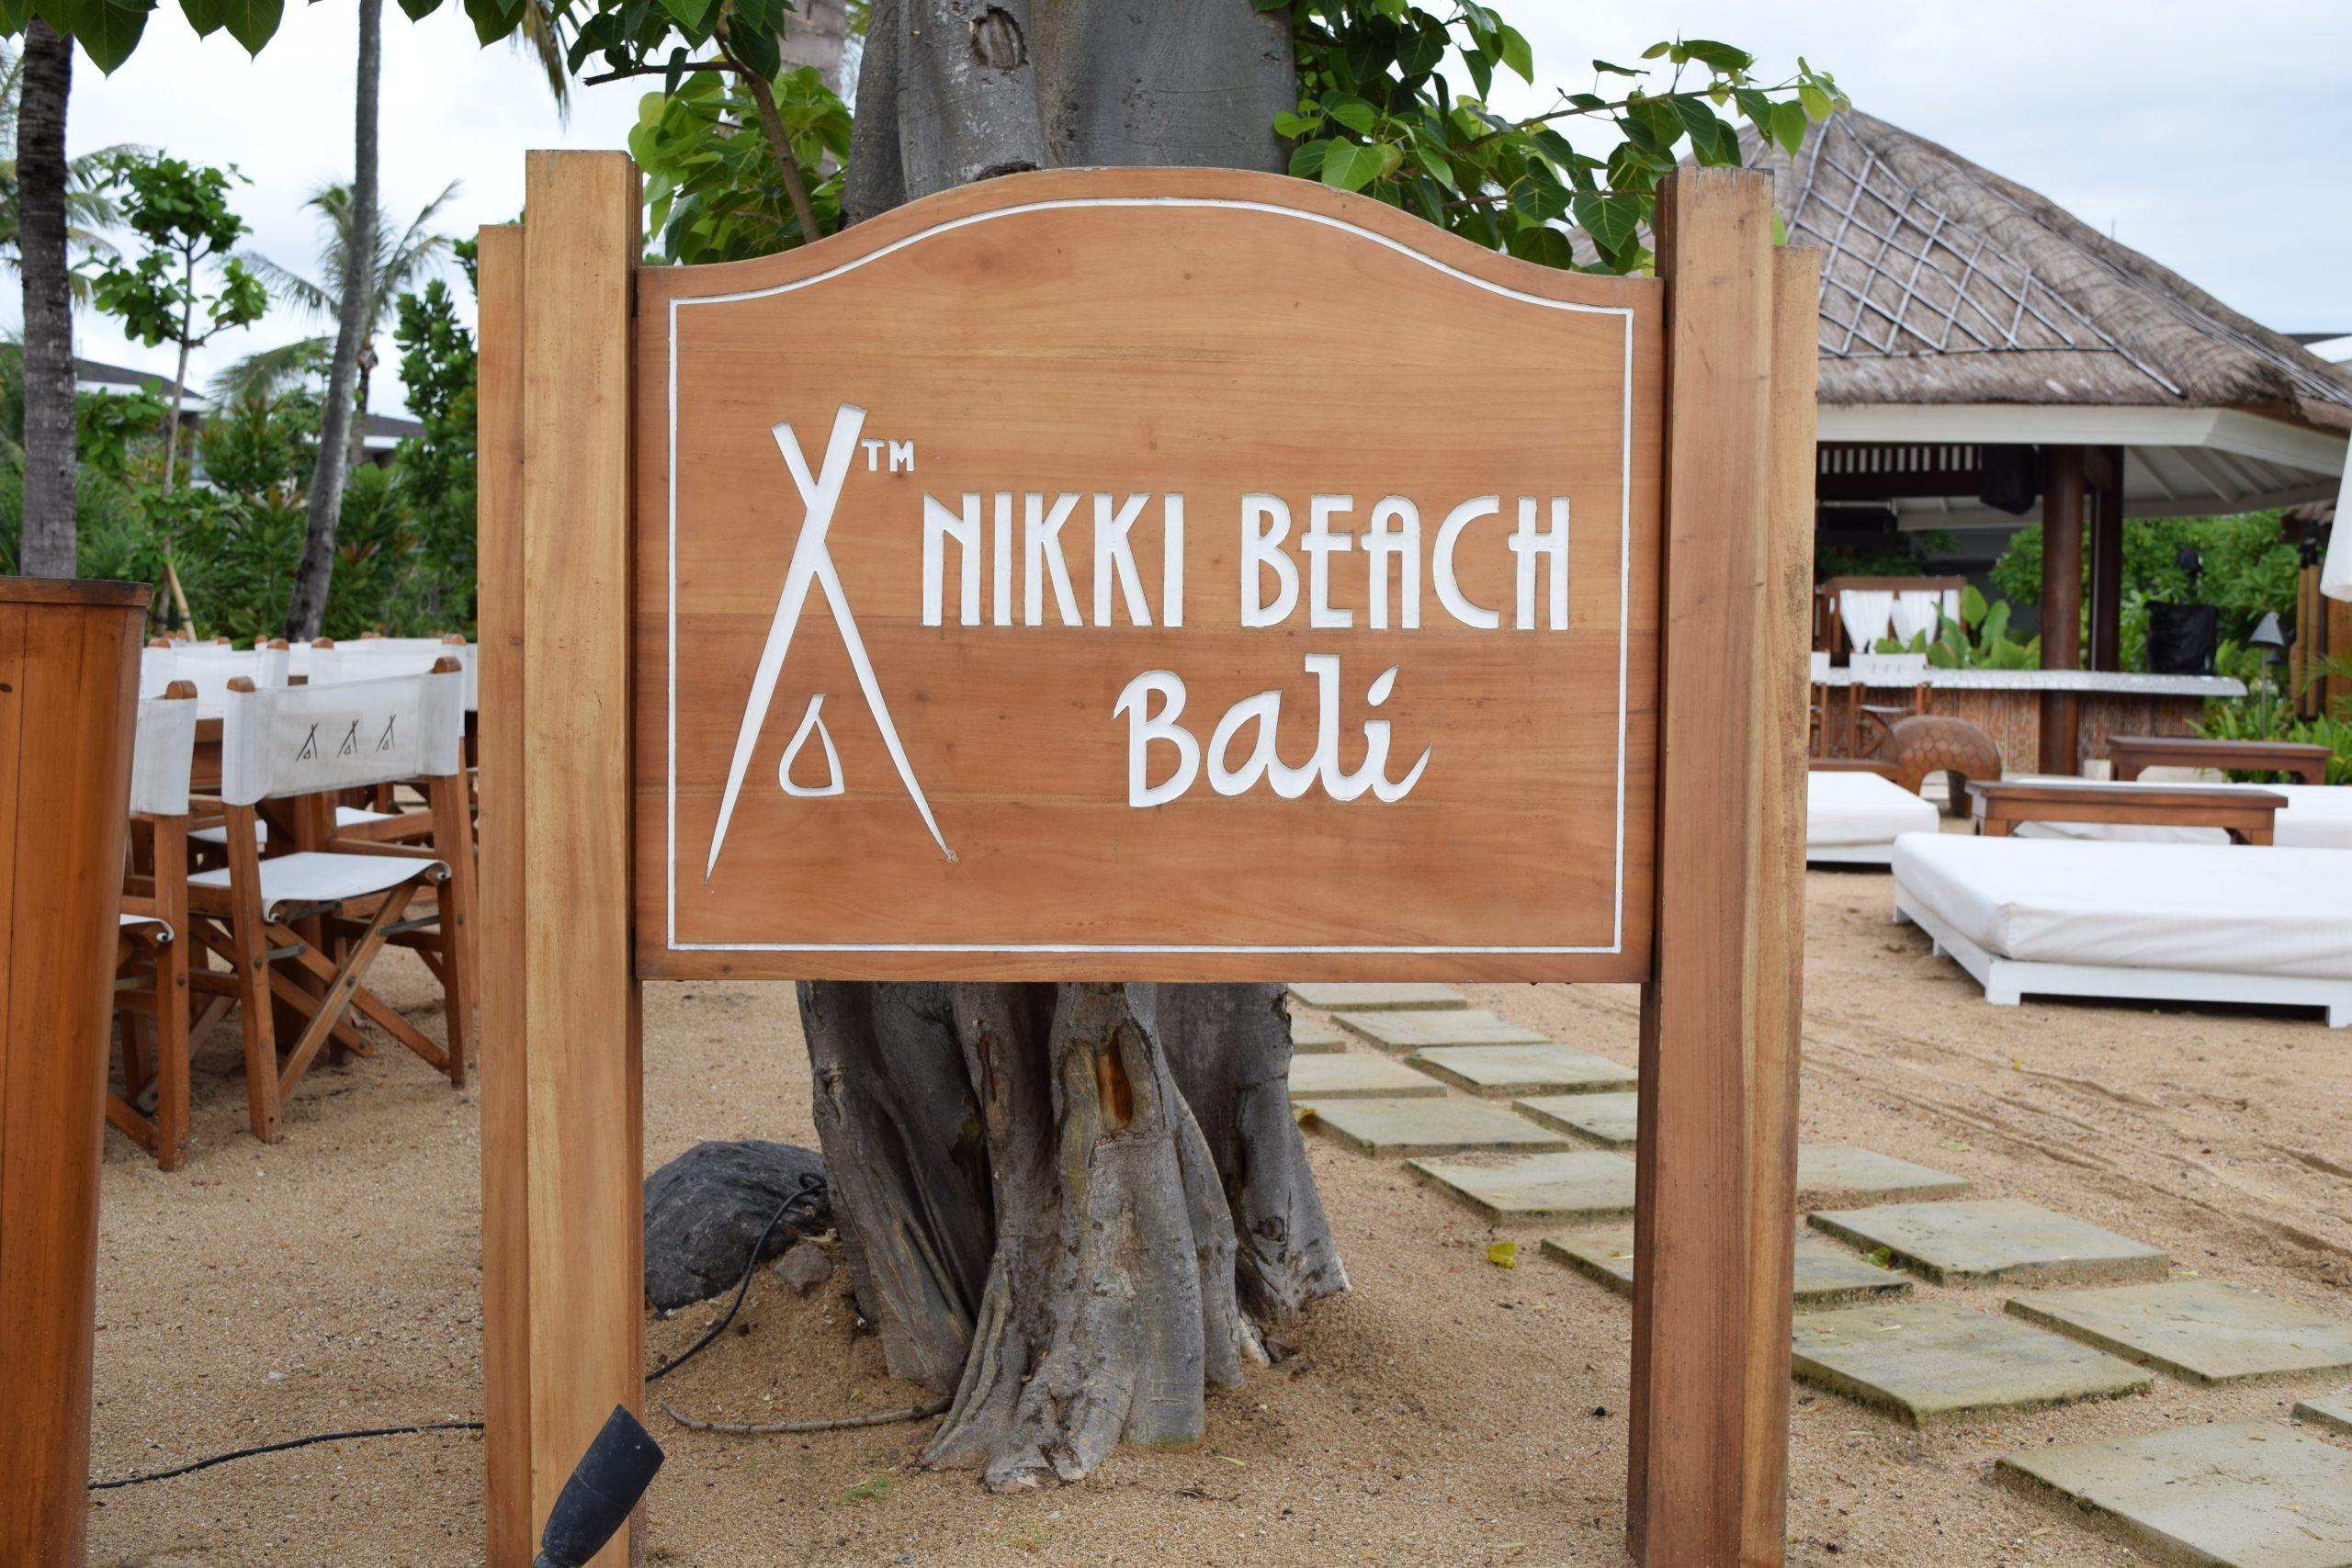 A signage board in Bali